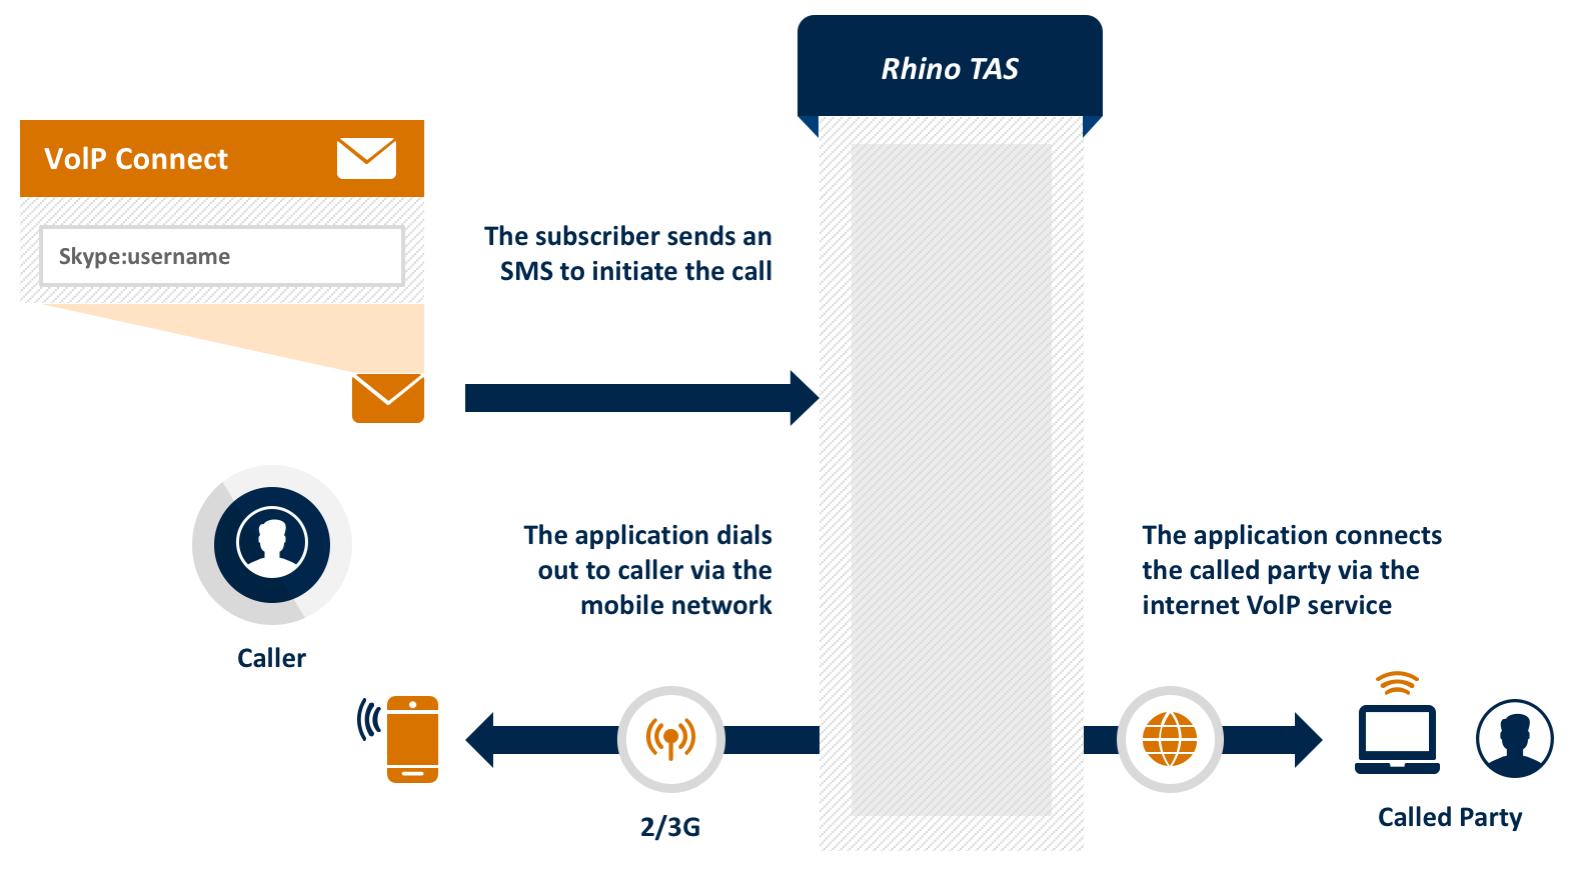 Rhino TAS app: VoIP Service Connect